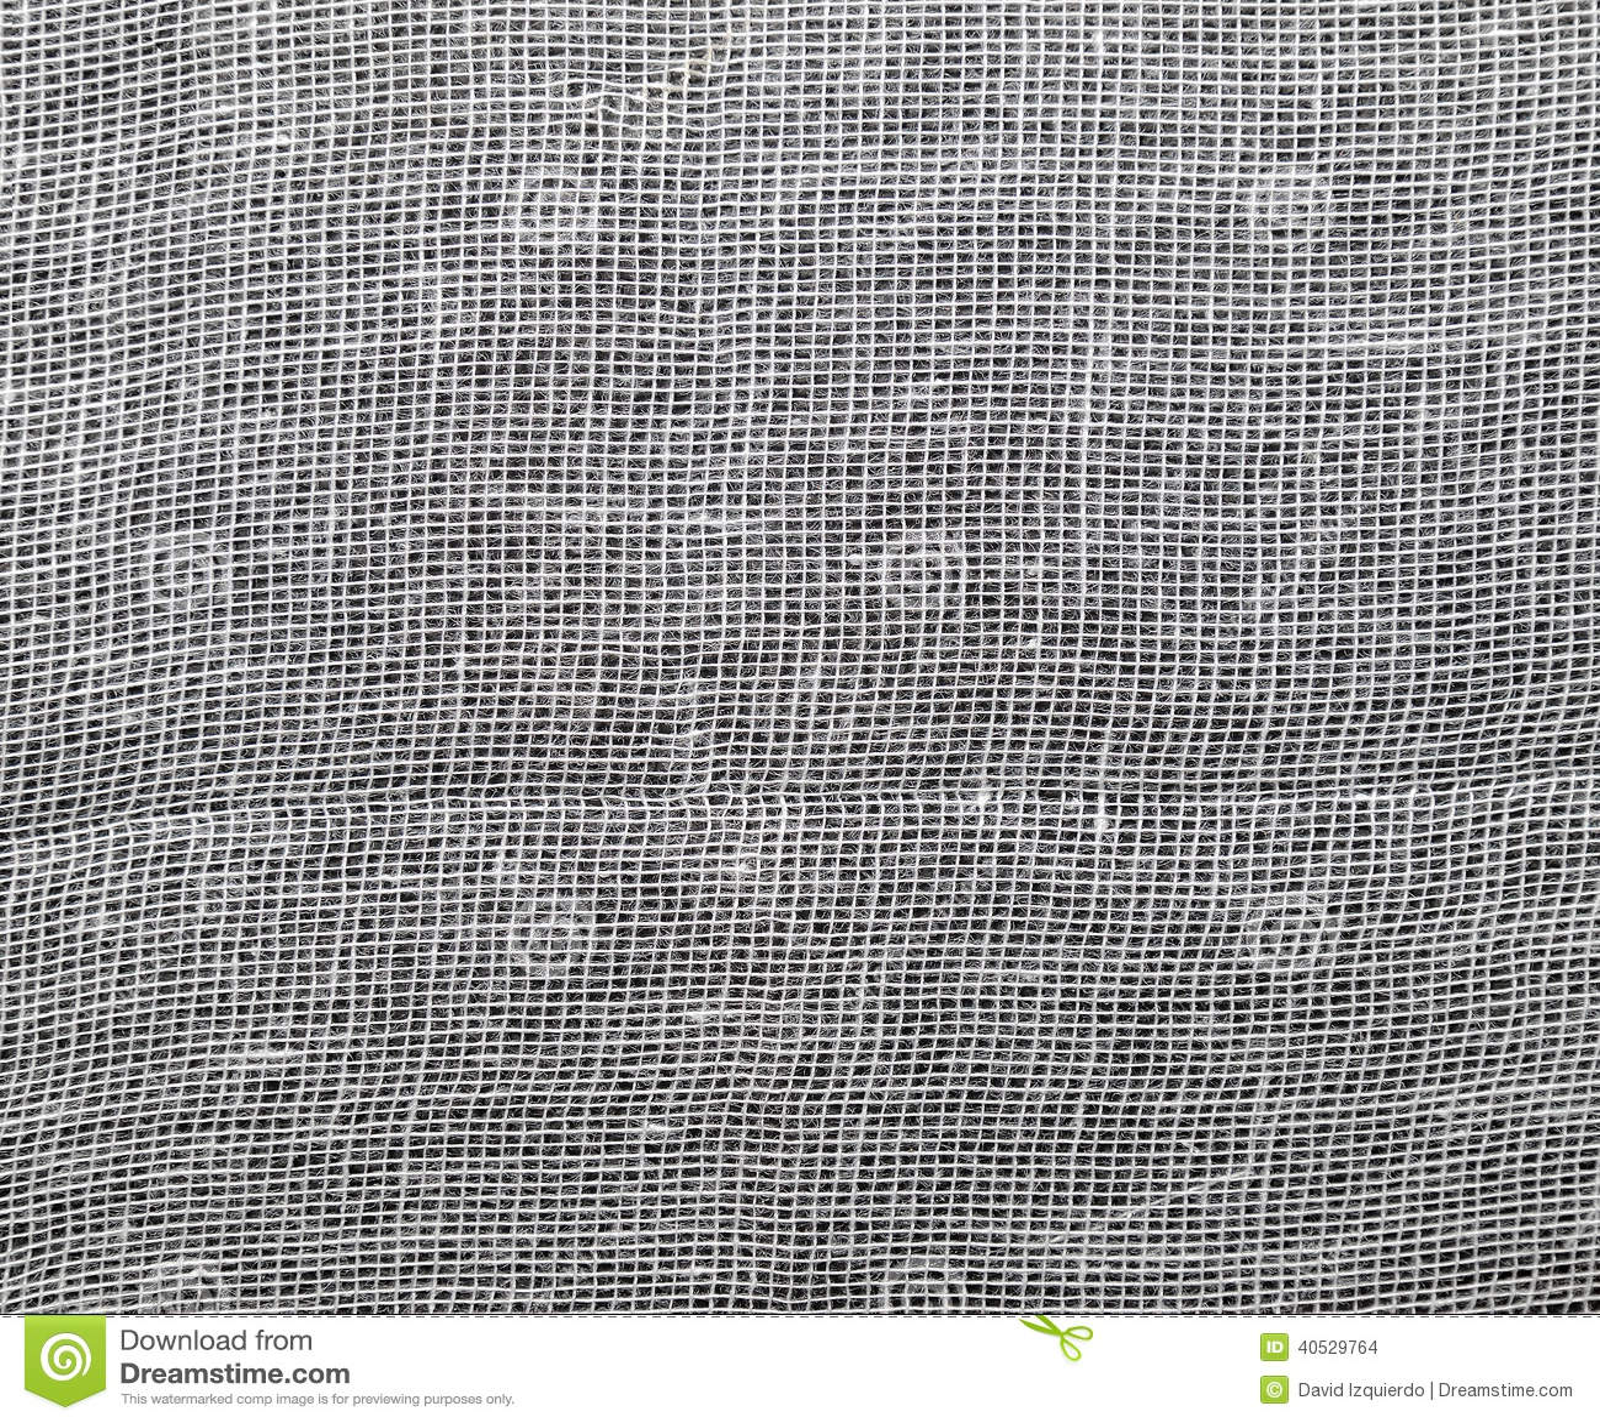 Wire gauze texture stock photo. Image of emergency, macro - 40529764